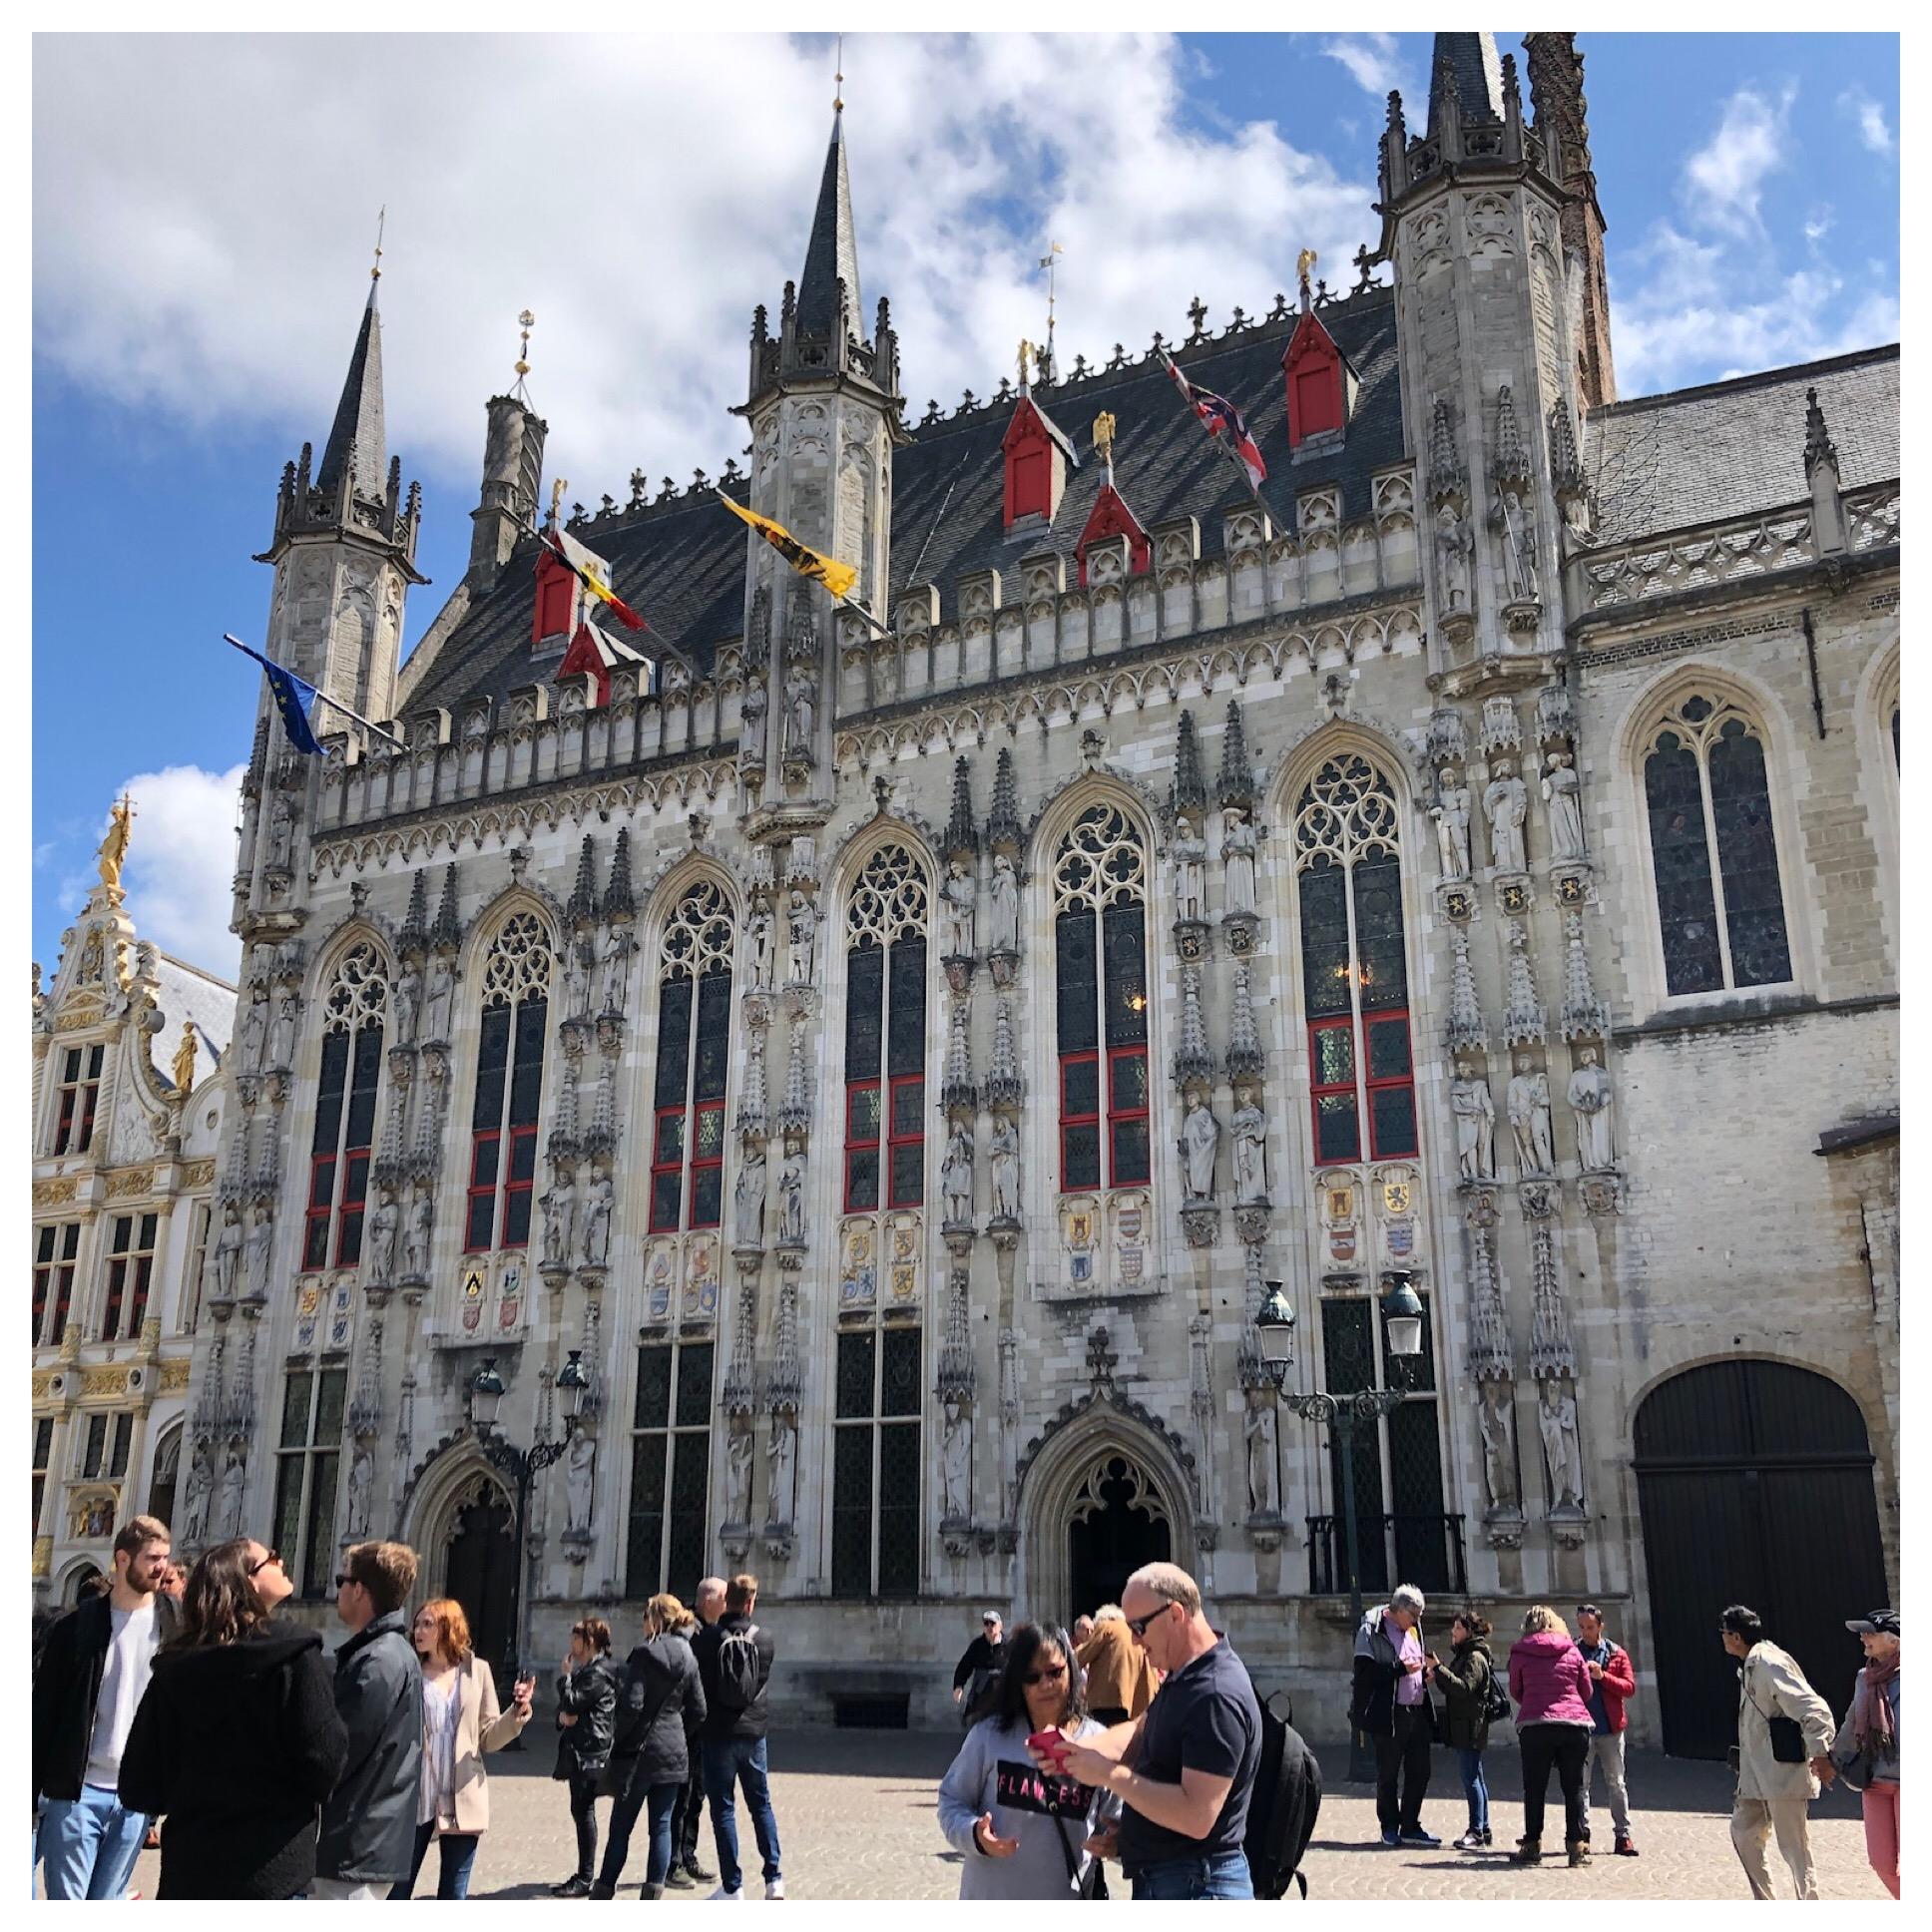 City Hall on Burg Square.